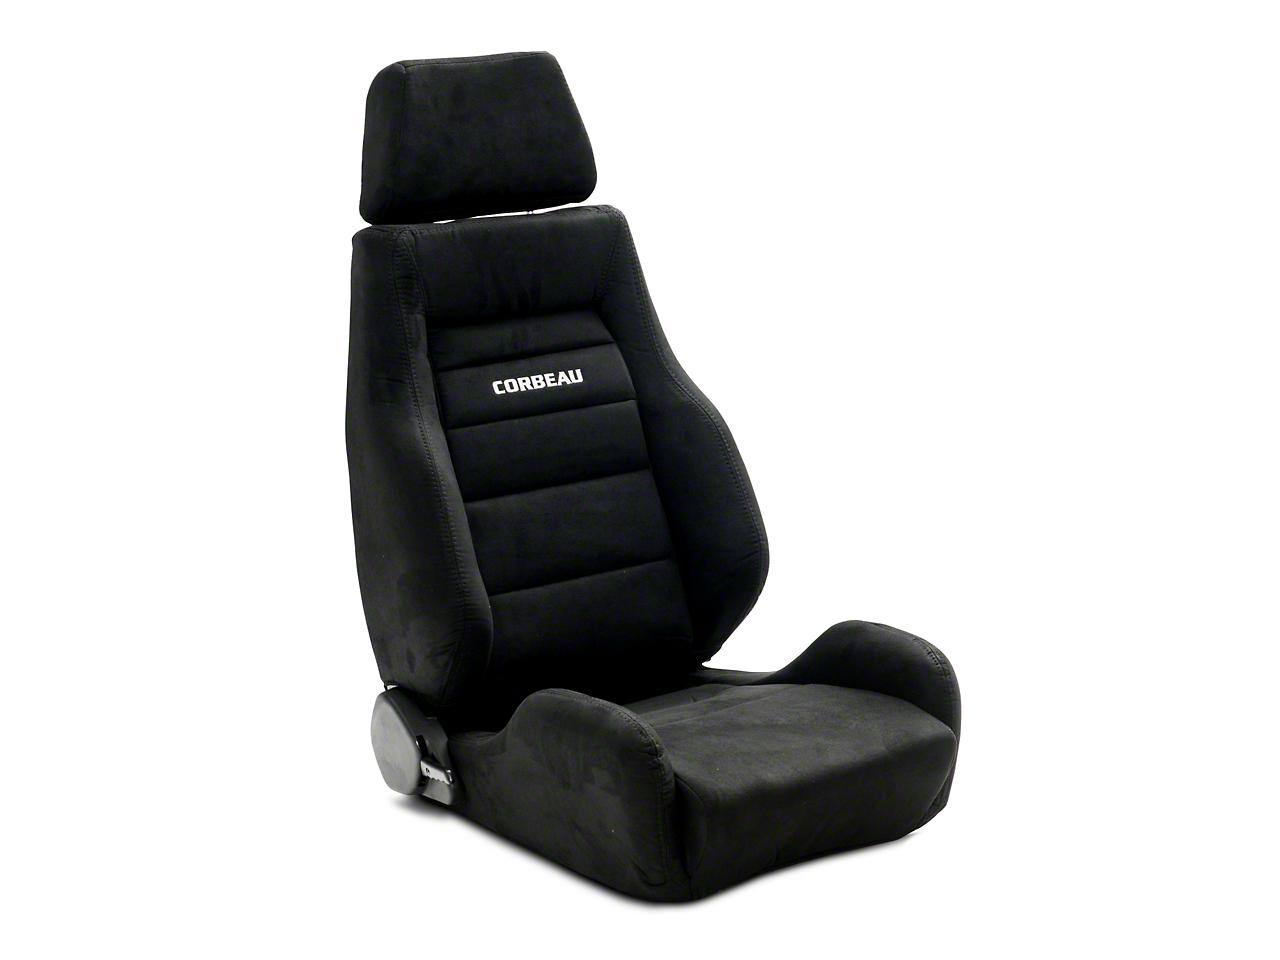 Corbeau GTS II Reclining Seat - Black Microsuede - Pair (79-19 All)